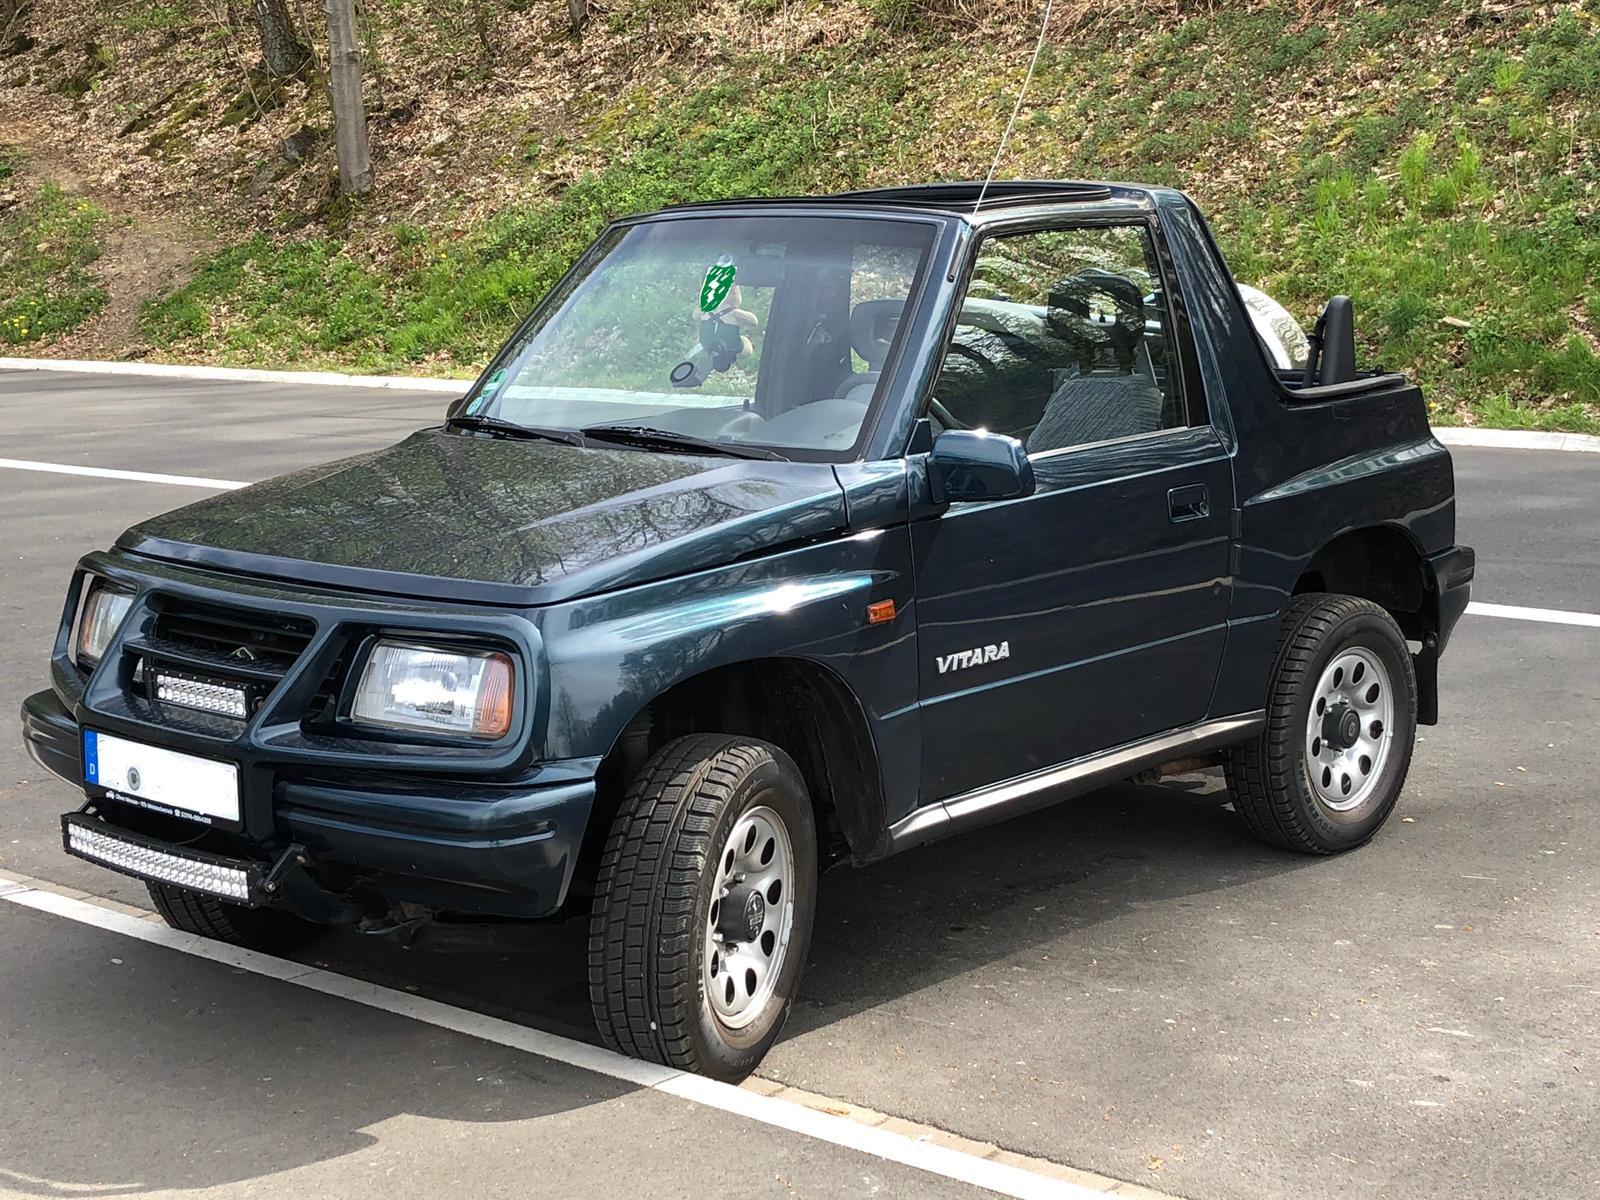 Suzuki Vitara: Bodylift & Lightbars nachgerüstet